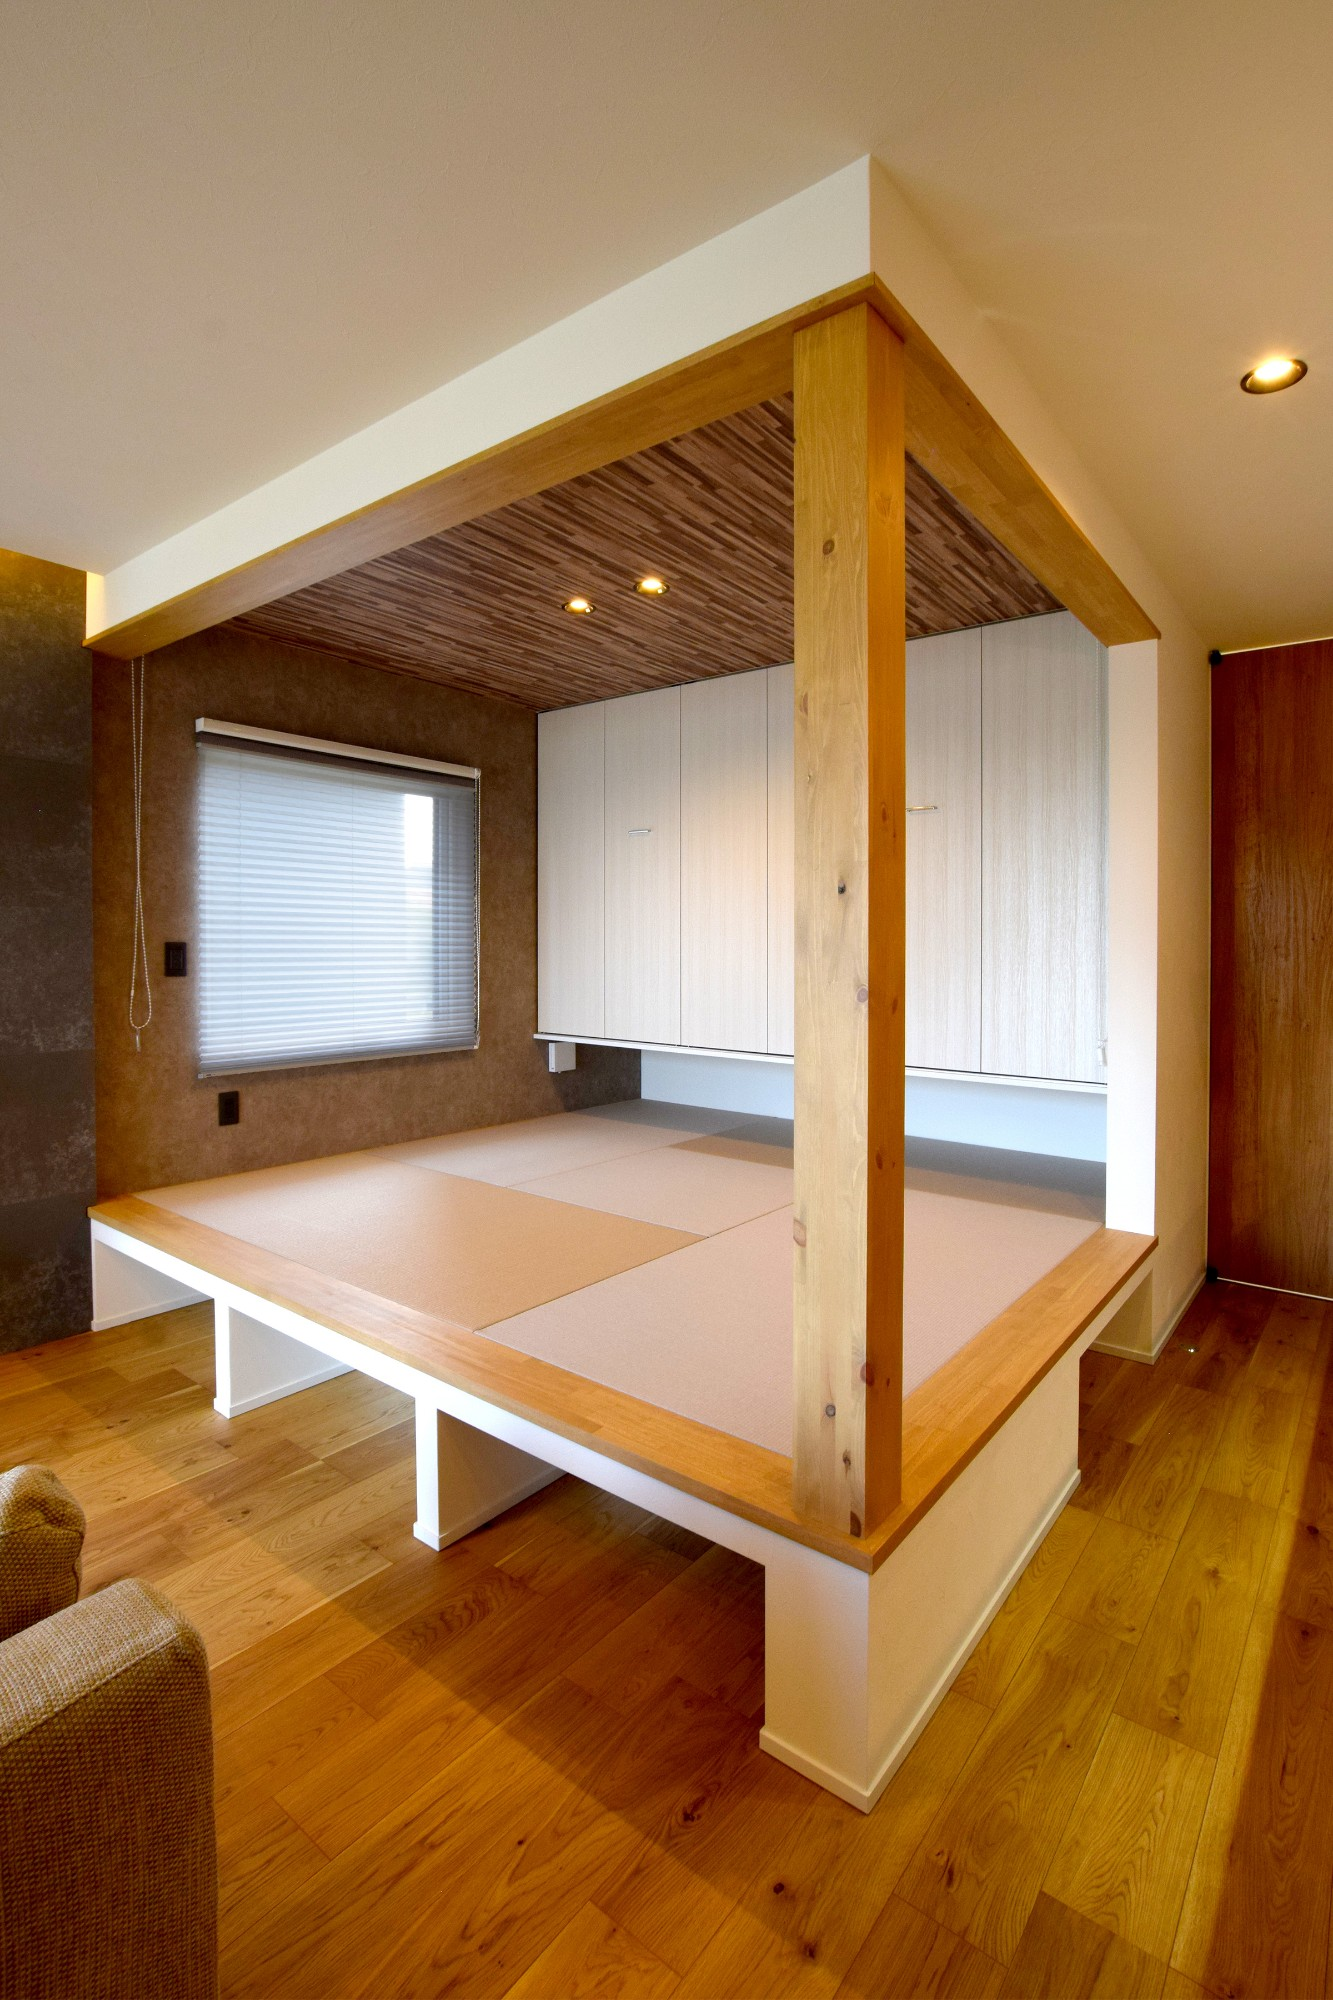 DETAIL HOME(ディテールホーム)「オークを基調としたナチュラルモダンな家」のシンプル・ナチュラルな居室の実例写真